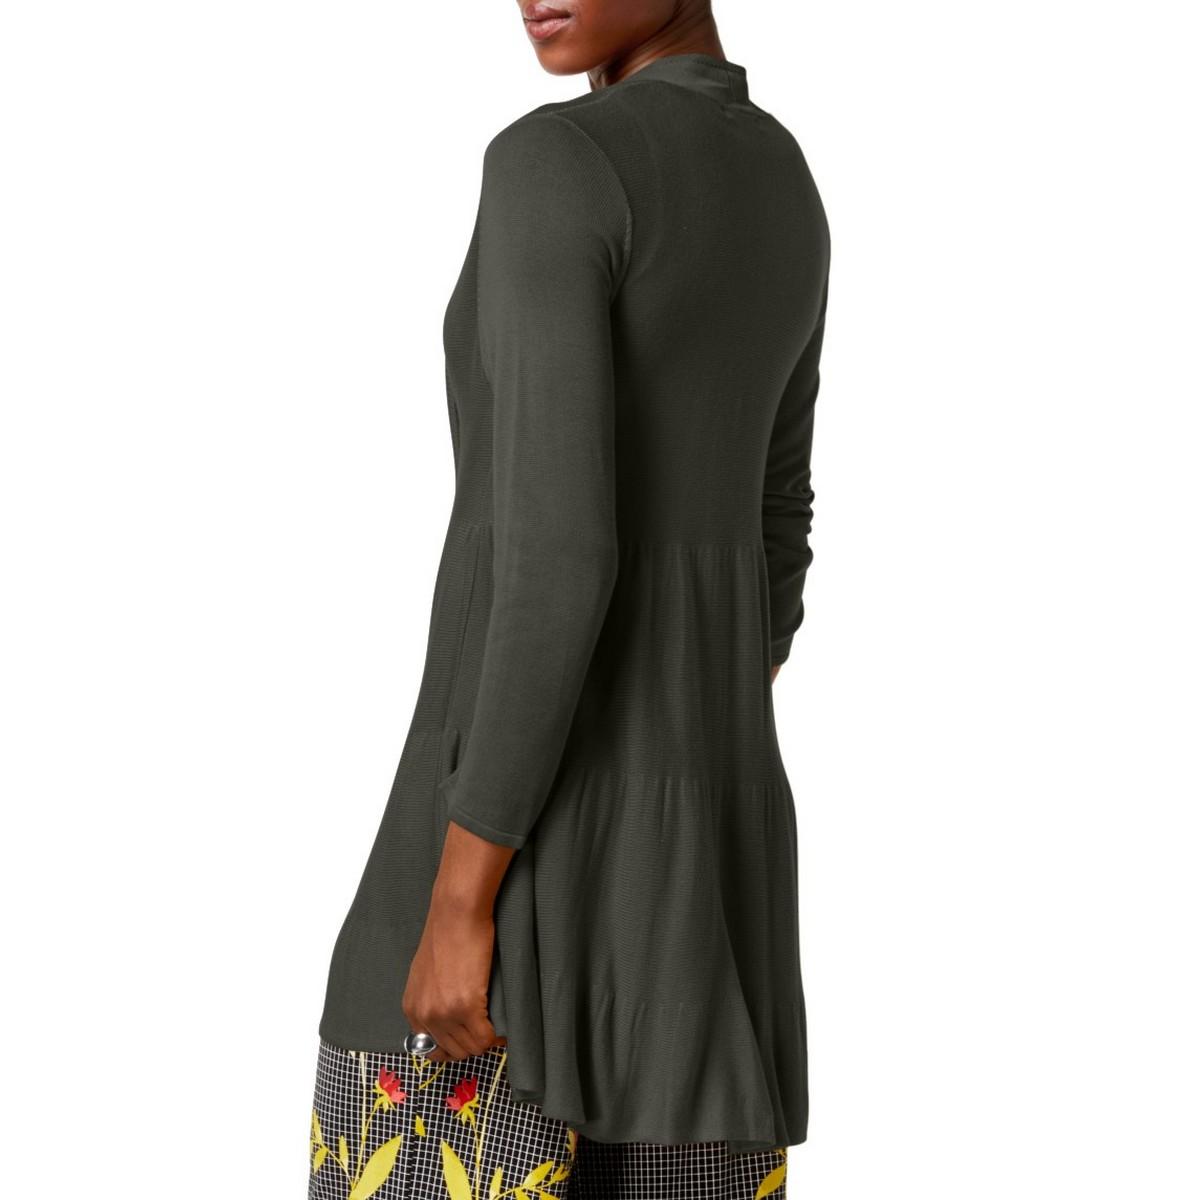 ALFANI-NEW-Women-039-s-Tiered-Open-Front-Cardigan-Sweater-Top-TEDO thumbnail 4